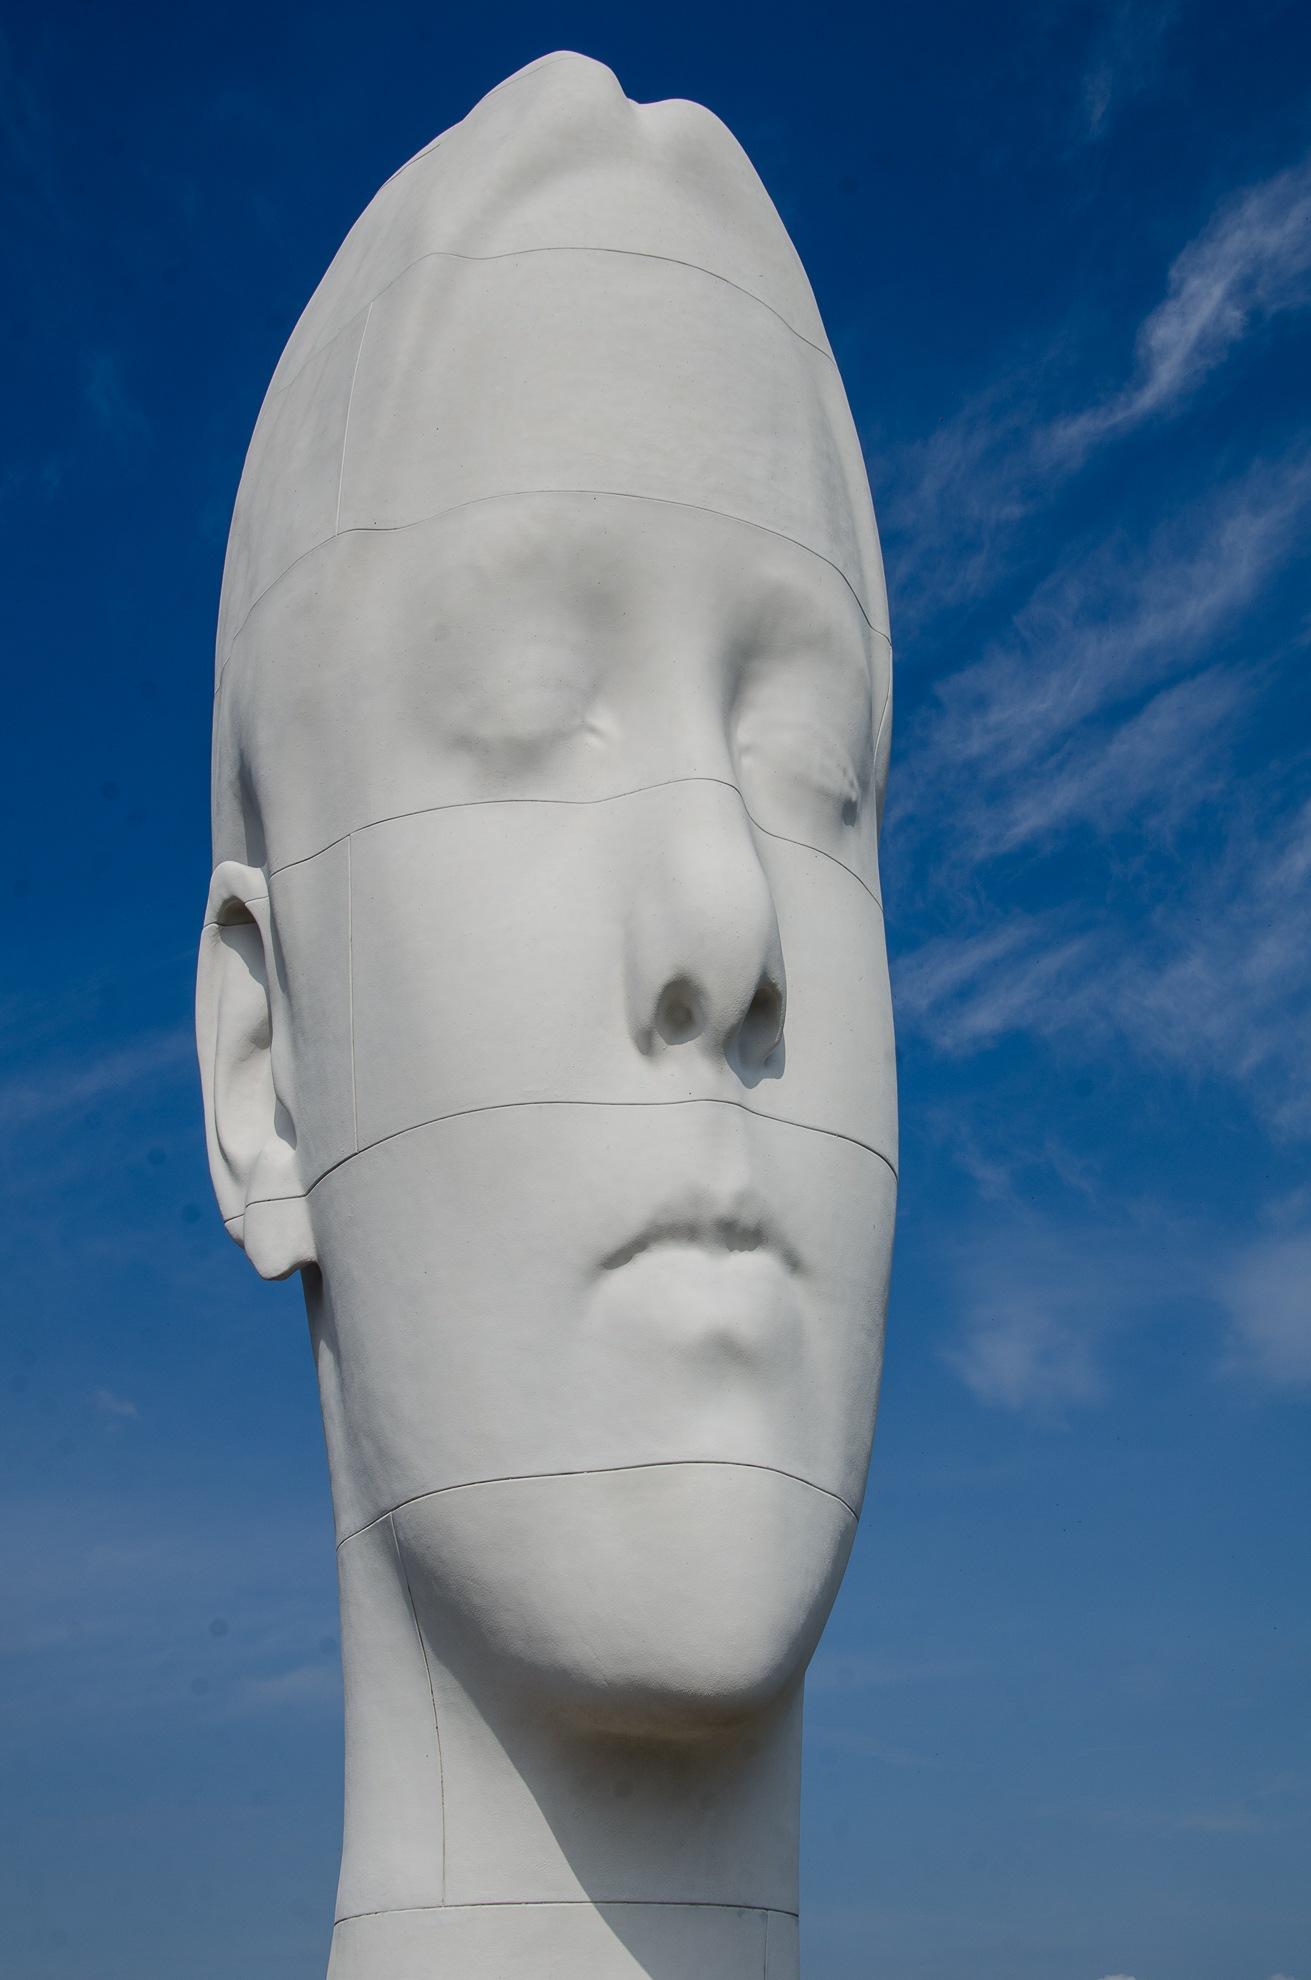 The big Sculpture  Name Anna Pilane by Anna-Karin Larsson